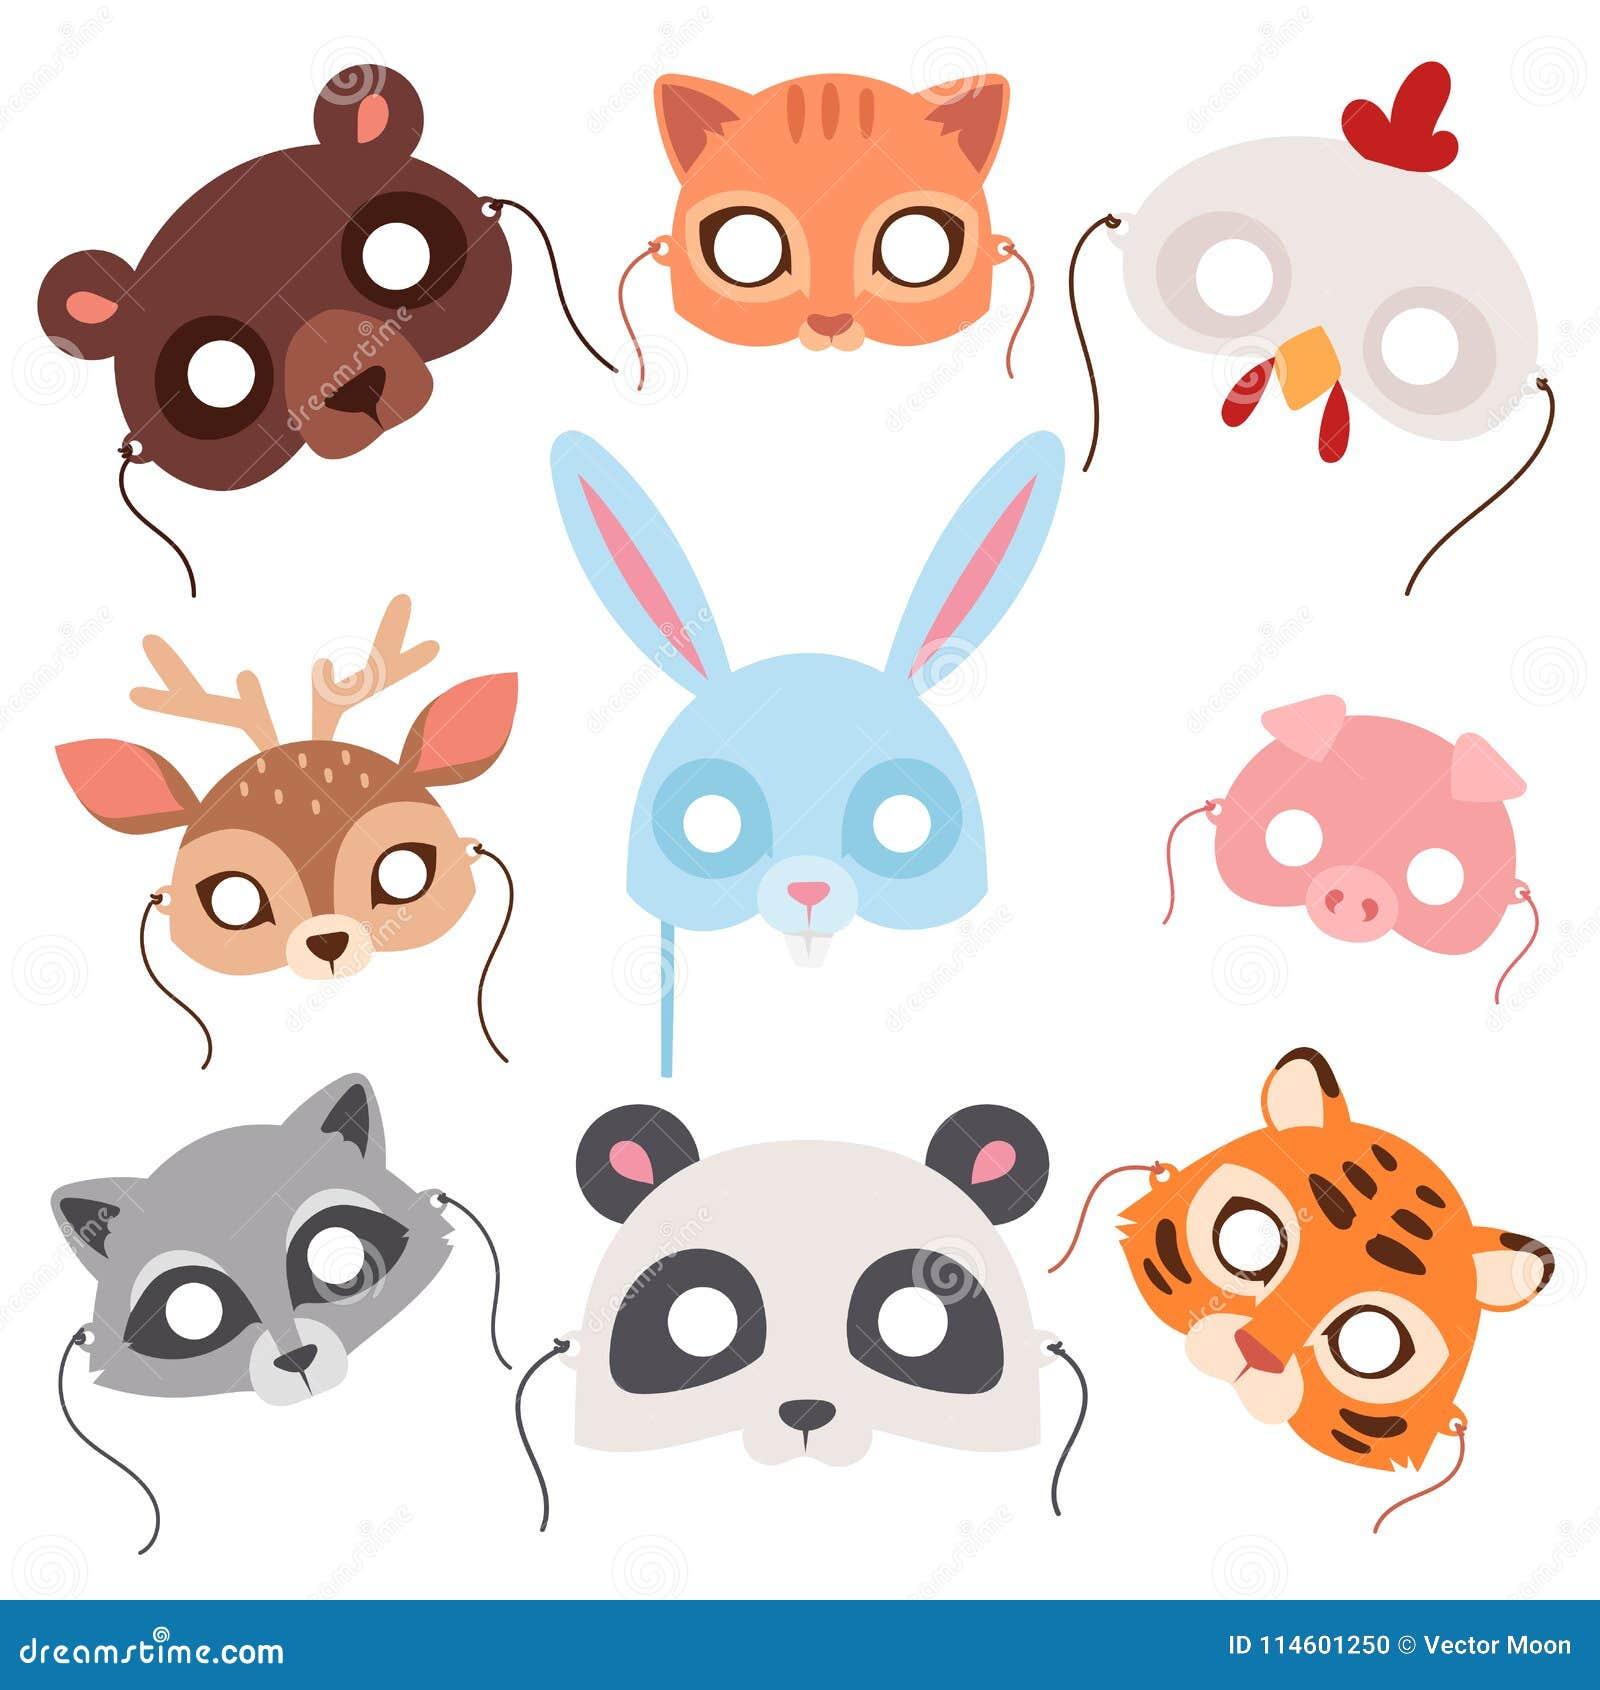 Animals Carnival Mask Vector Festival Decoration Masquerade